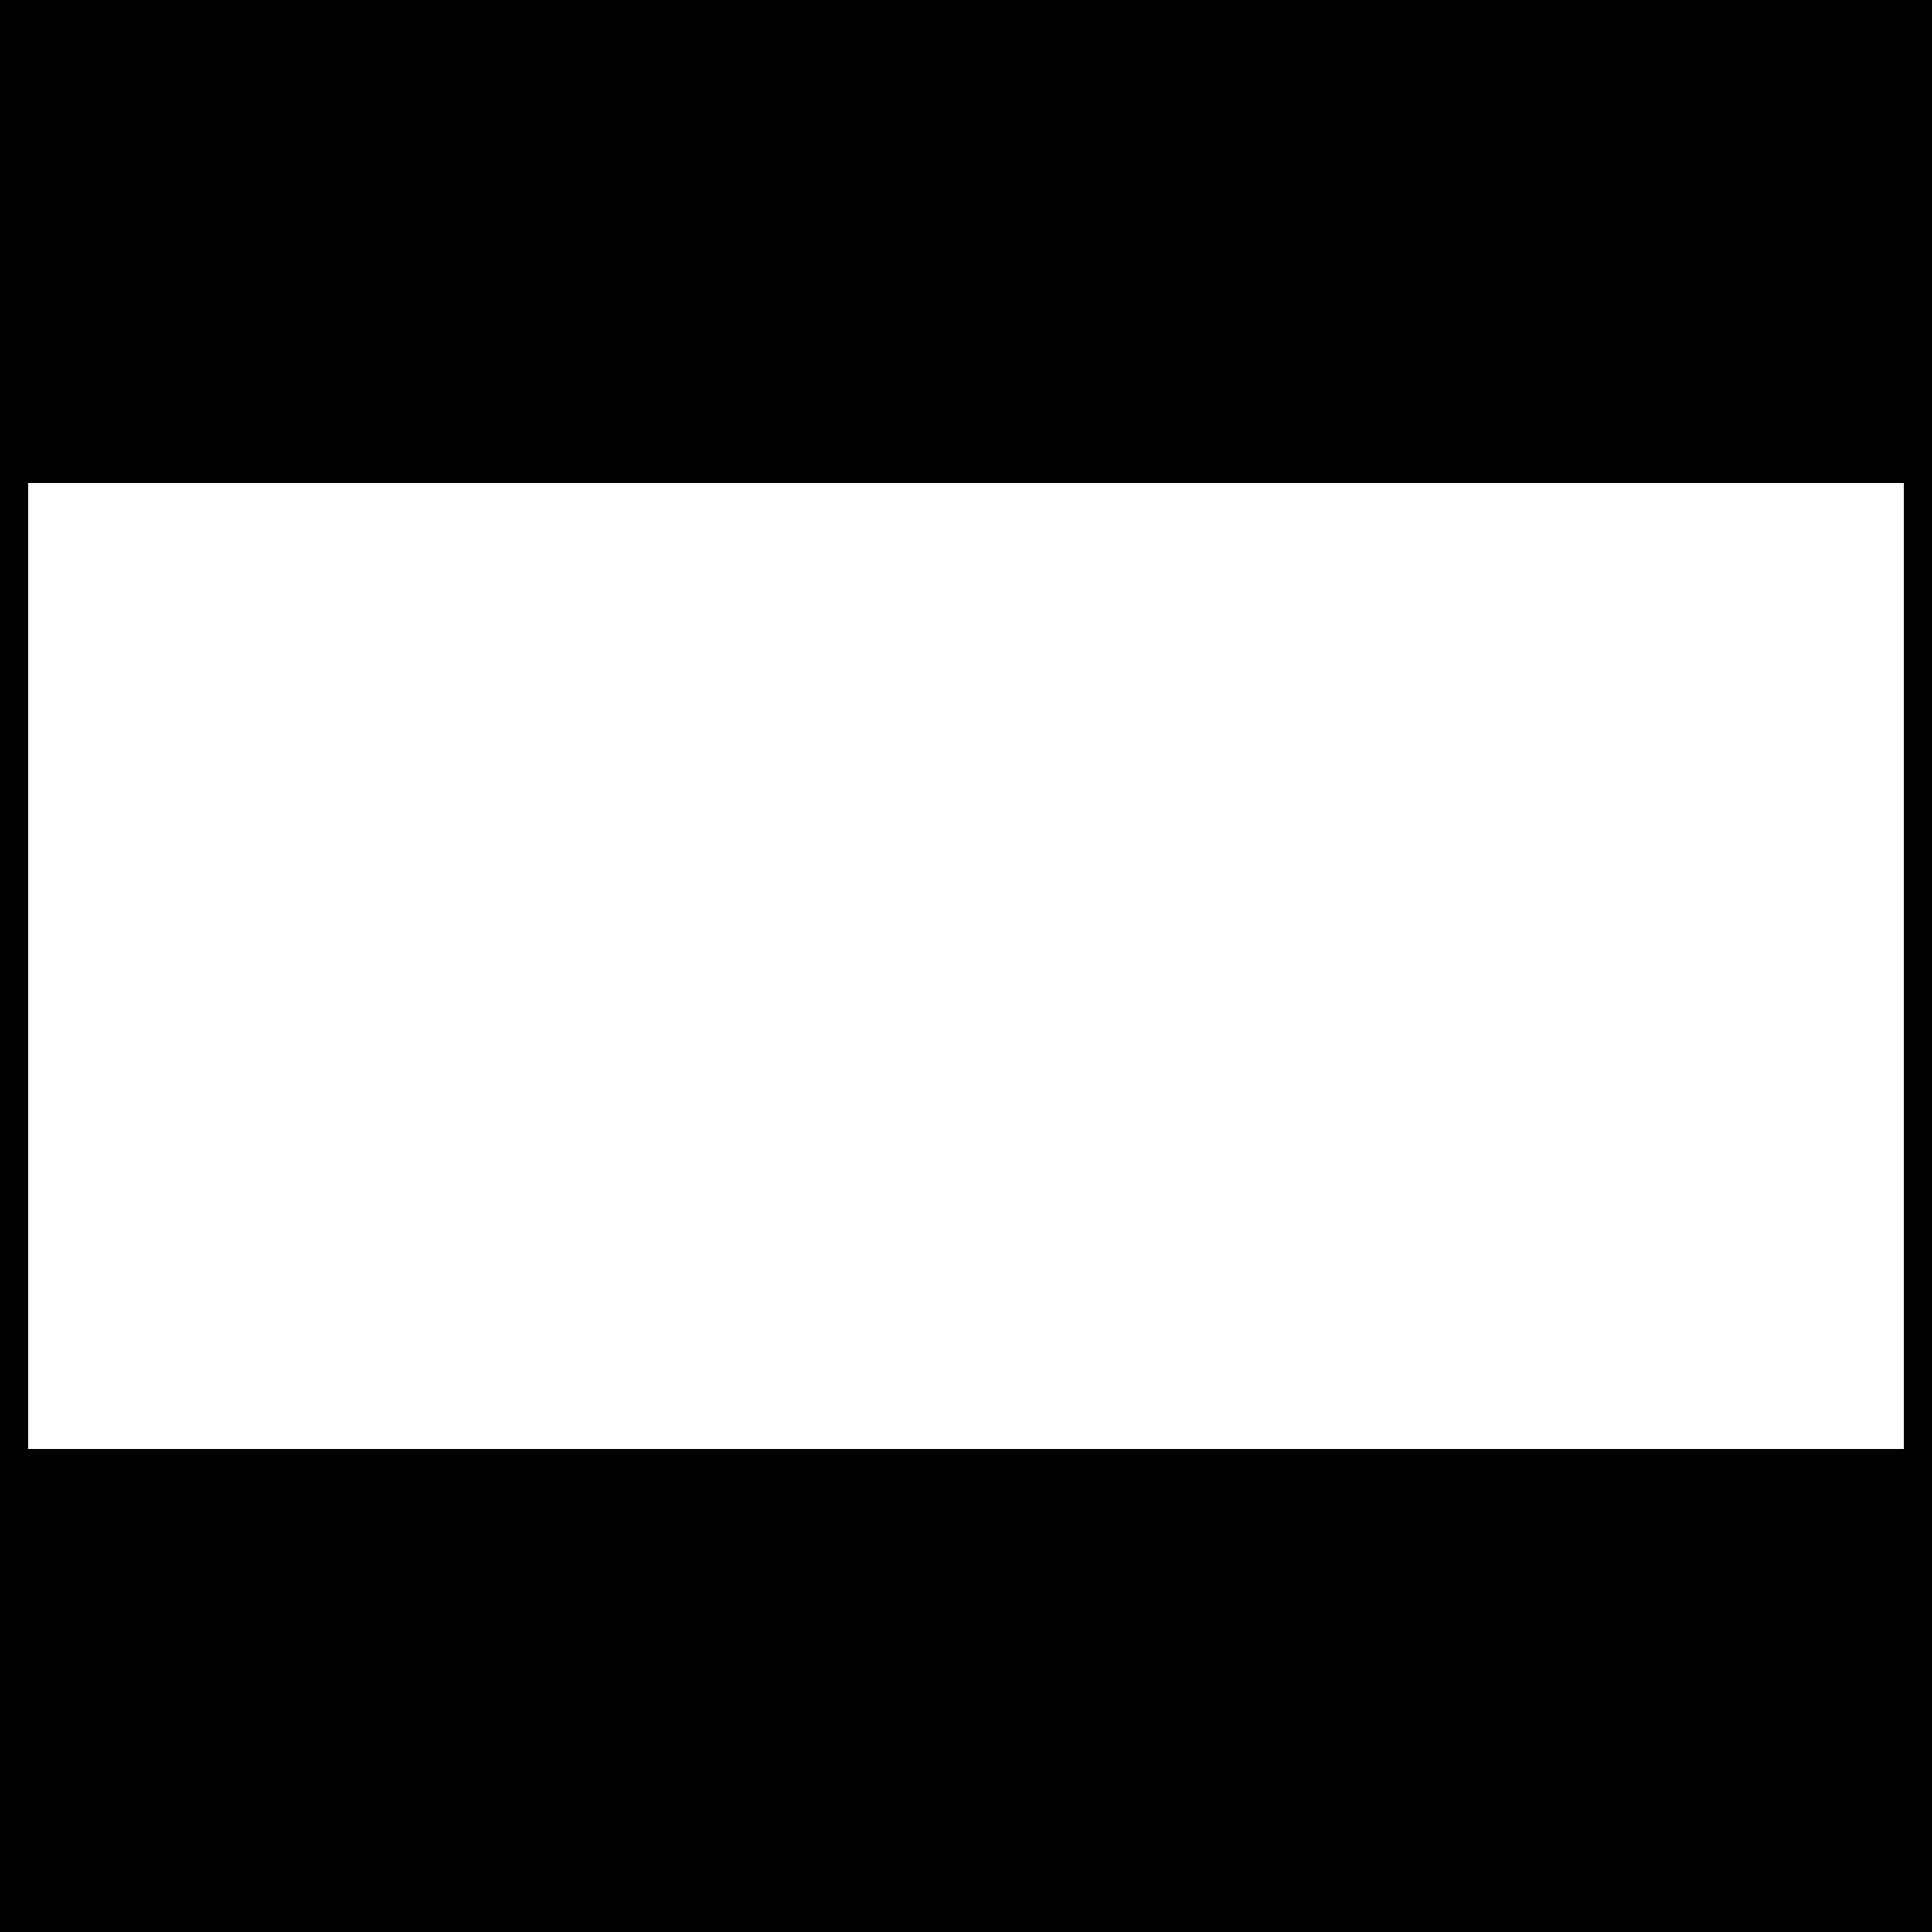 #theworldismyrunway TRESemme